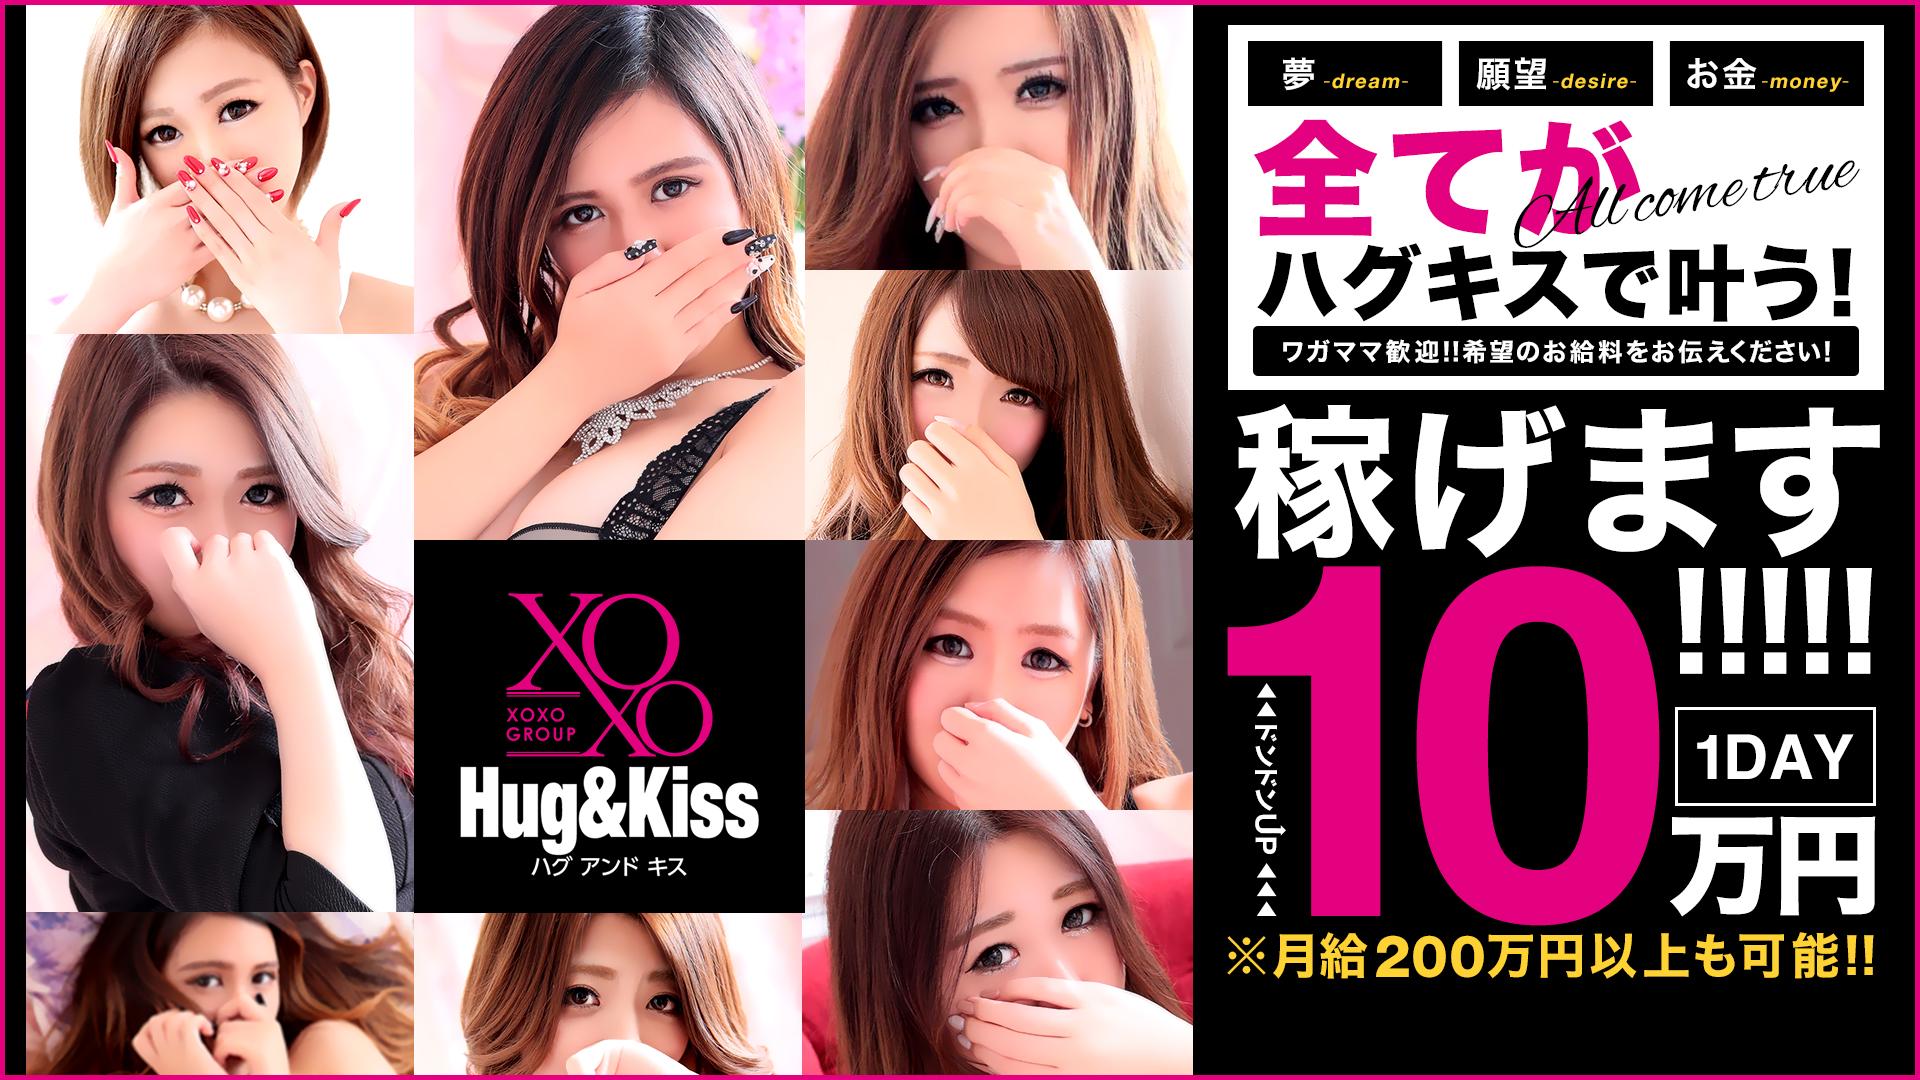 XOXO Hug&Kiss 神戸店の求人画像